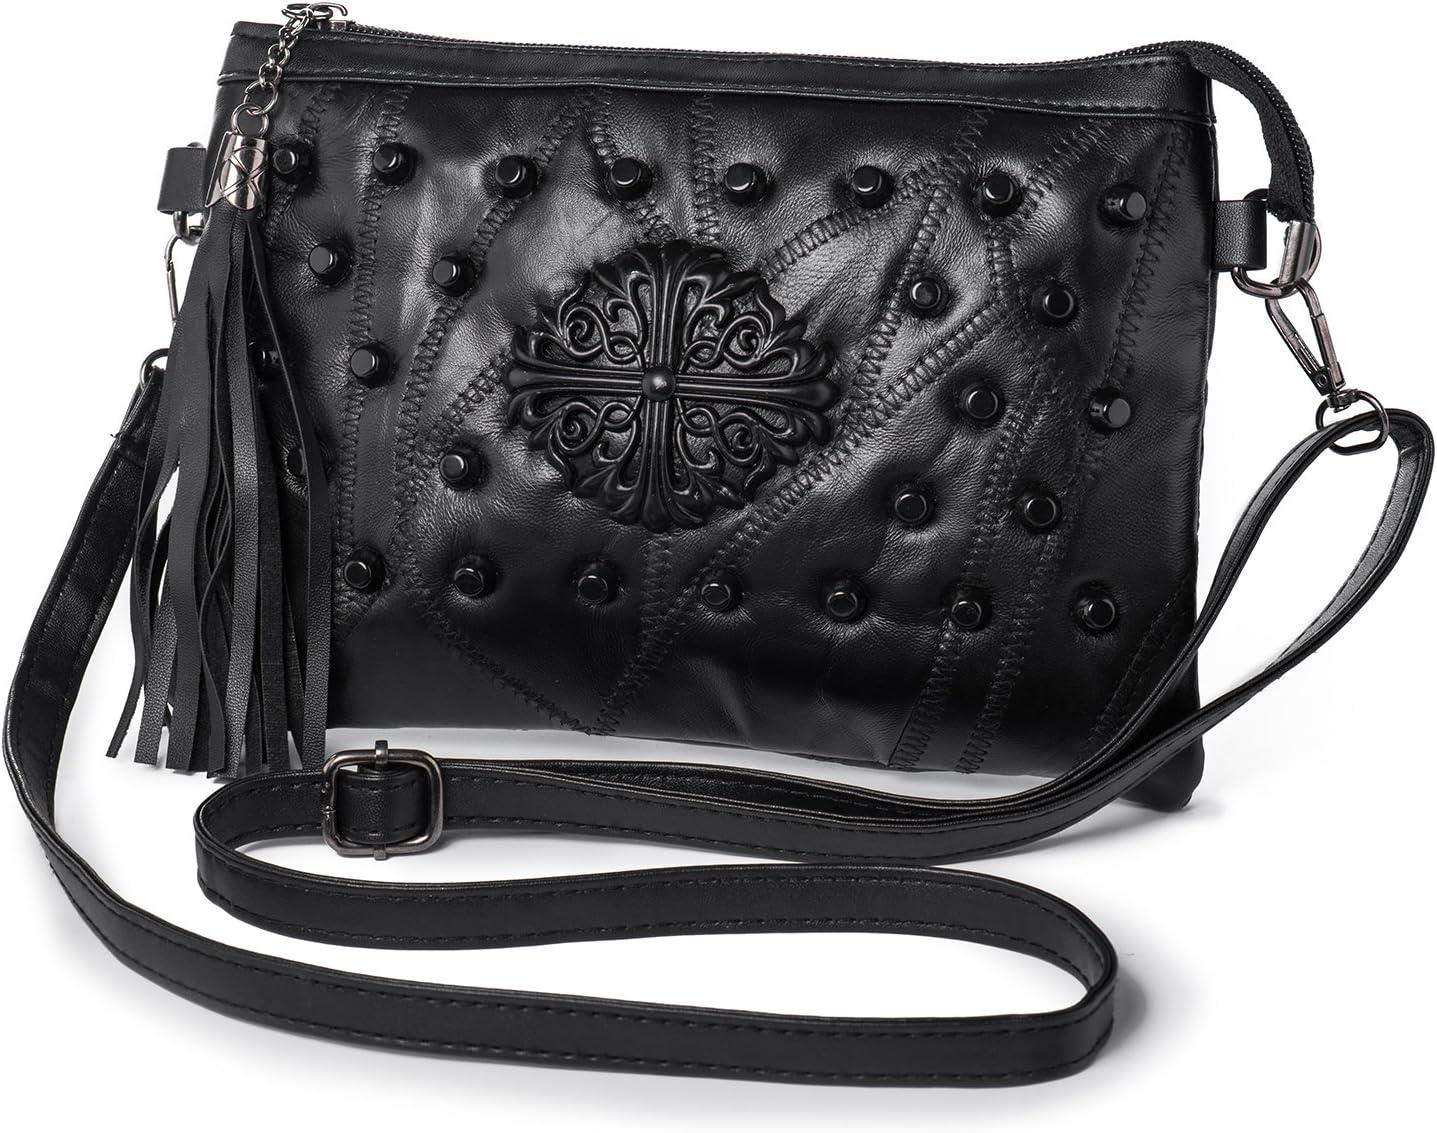 Large Black Clutch Bag Multi Compartment Cross Body Purse Bag Wallet Wrist Strap